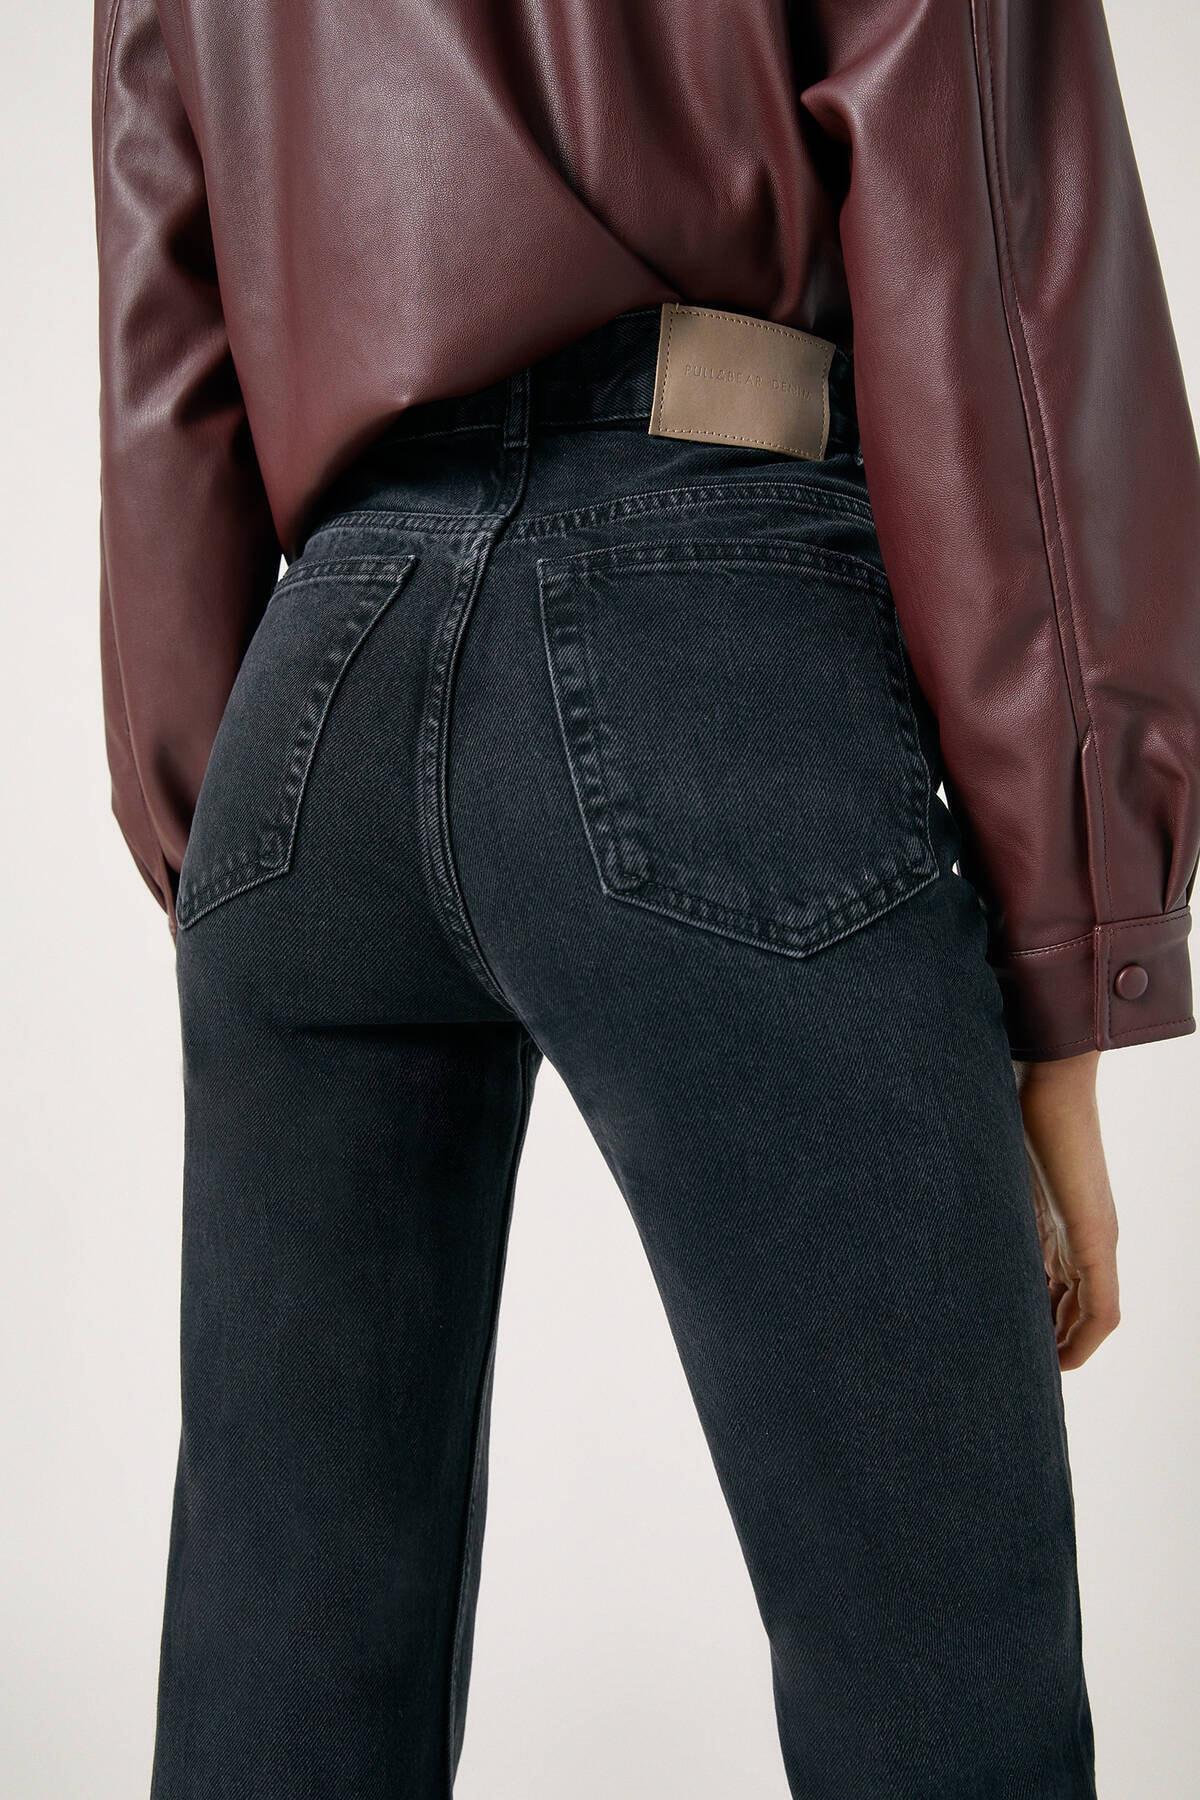 Pull & Bear Kadın Siyah High Waist Jeans With Seam Detail 09683326 2